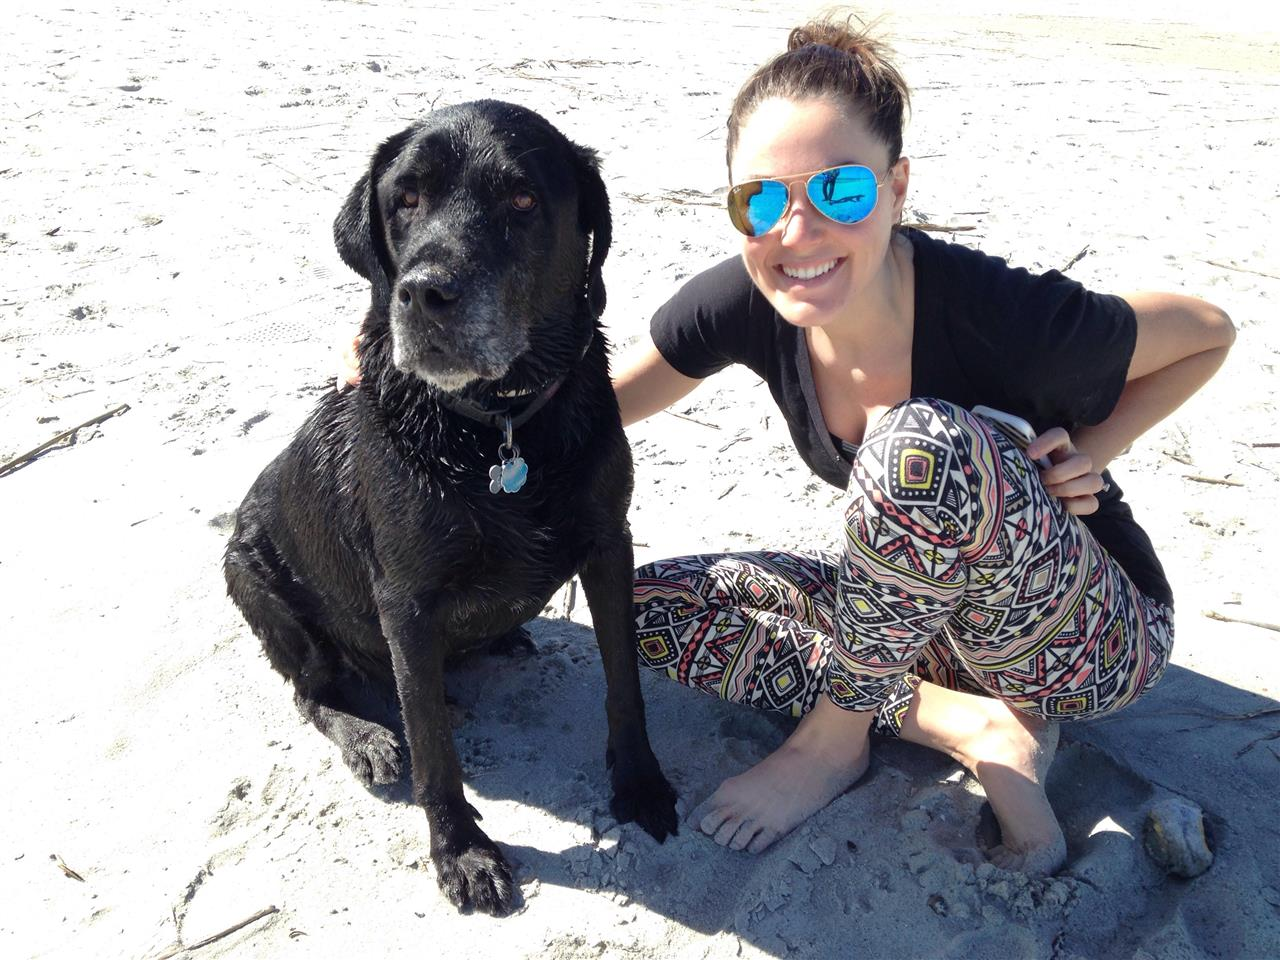 Hilton Head Island SC,  best friends enjoy the beach for Valentine's Day